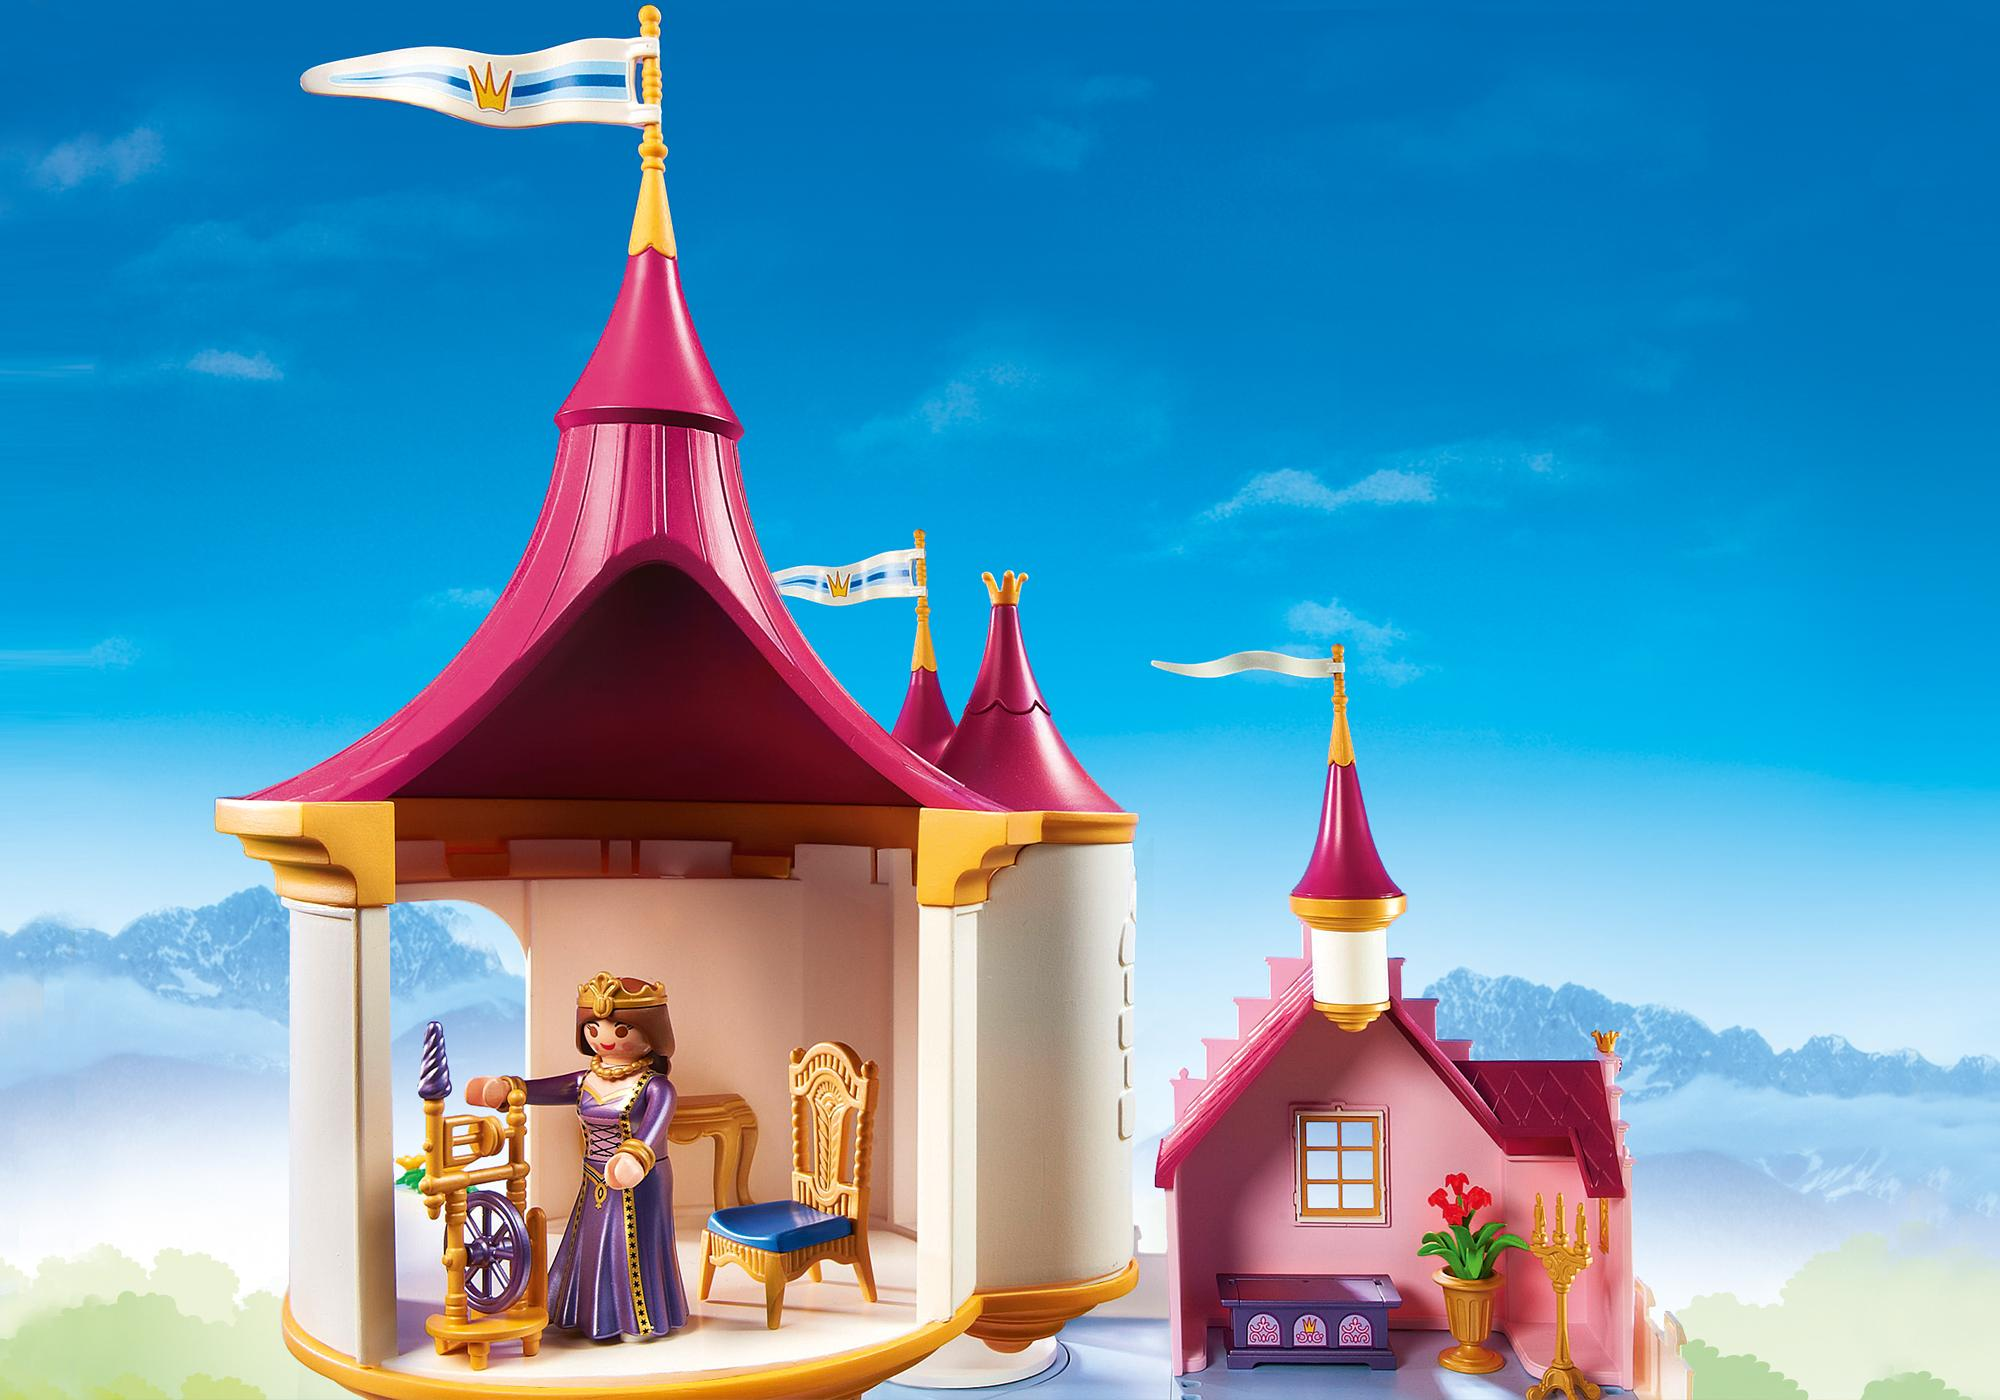 http://media.playmobil.com/i/playmobil/6848_product_extra2/Prinzessinnenschloss